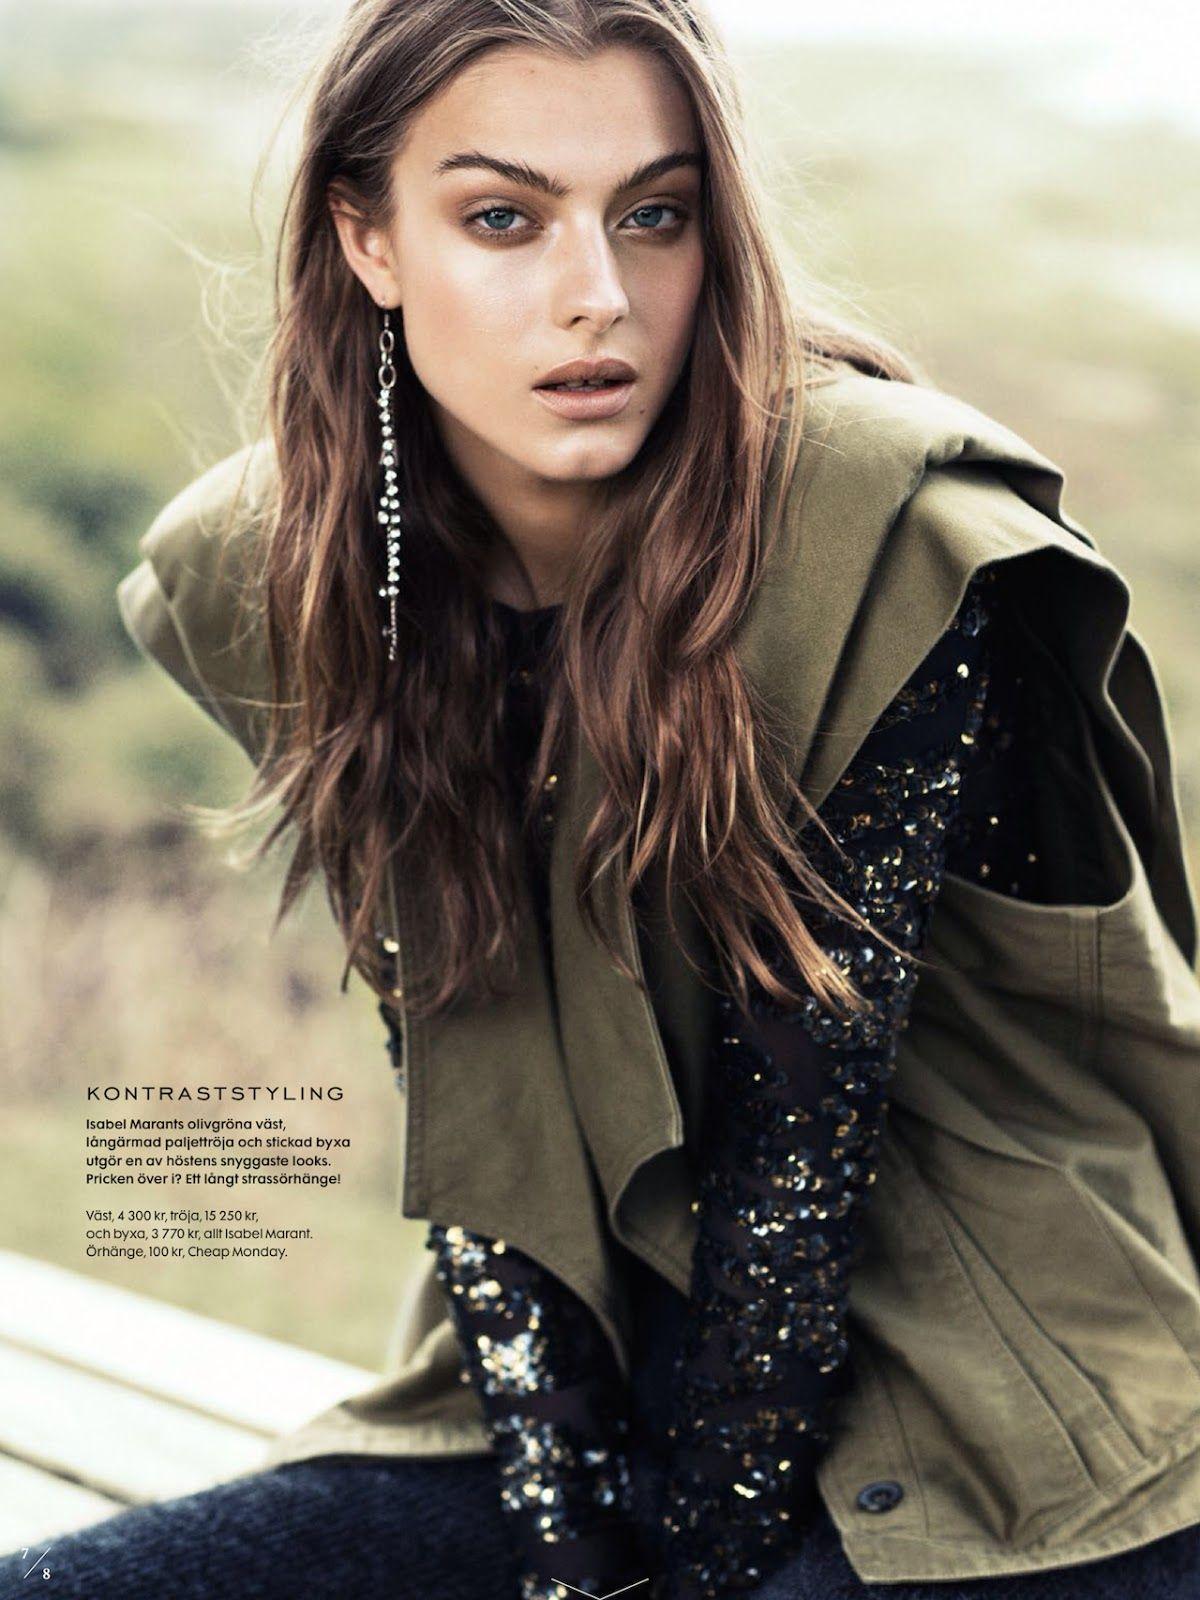 kamouflerad: lone praesto by honer akrawi for elle sweden september 2014 | visual optimism; fashion editorials, shows, campaigns & more!